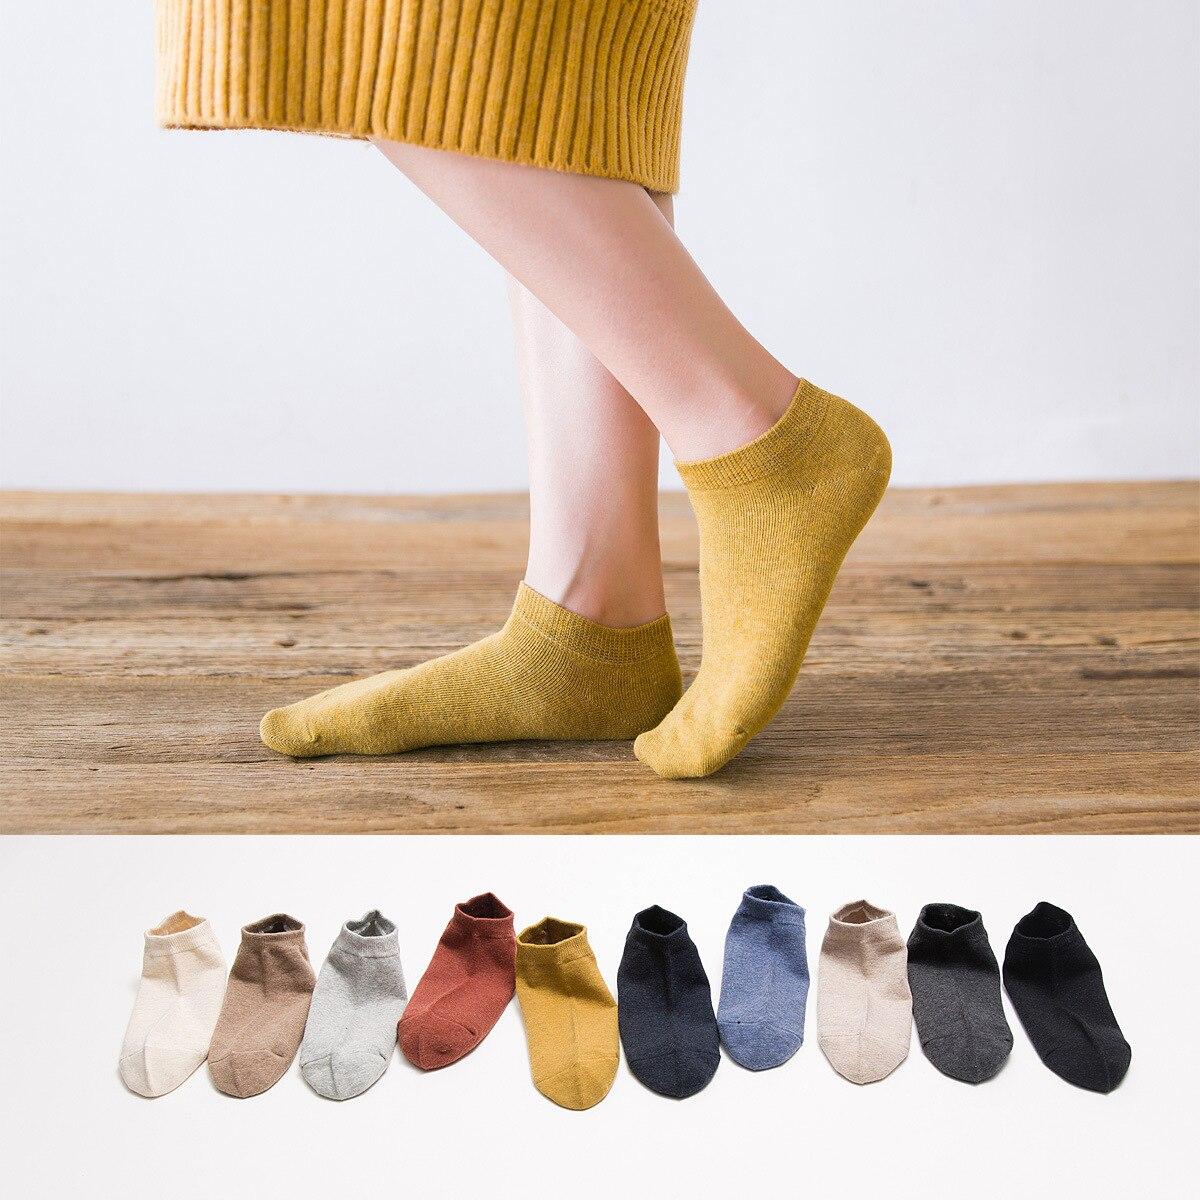 Hart baumwolle baumwolle frauen overalls plain einfarbige socken baumwollsocken großhandel high-end farbe spinn hersteller